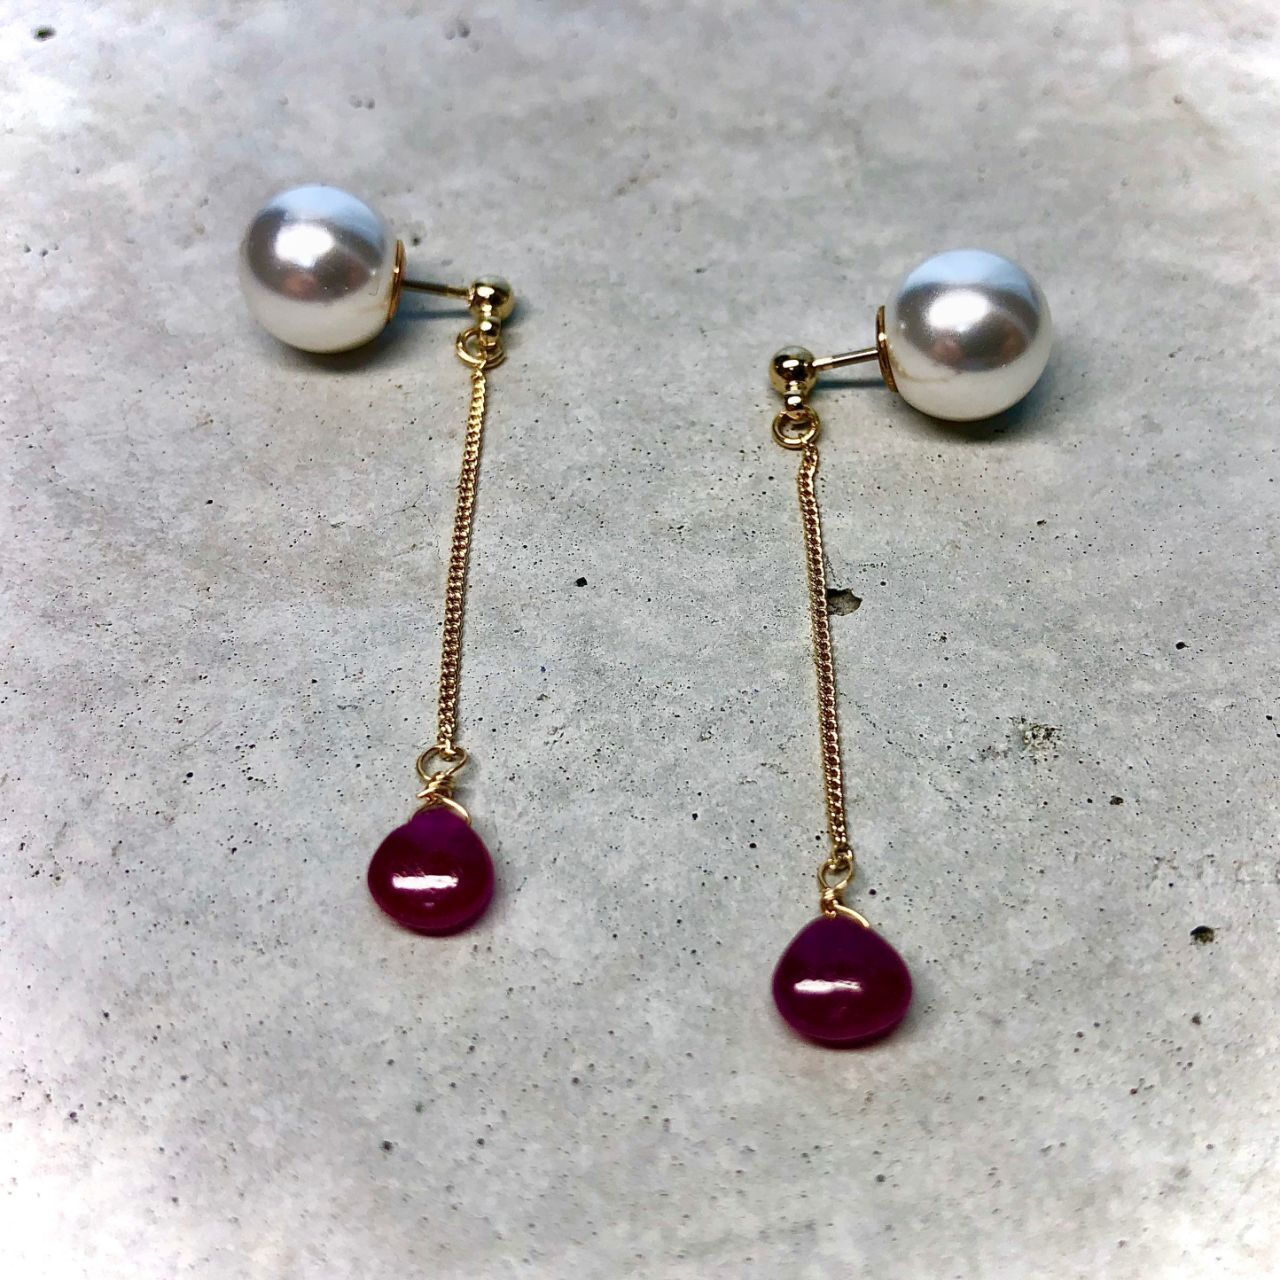 【LP-18BR】Ruby chain pierced  long/short〈再入荷〉                                                                    【LP-19BR】Lapis lazuli chain pierced  long/short